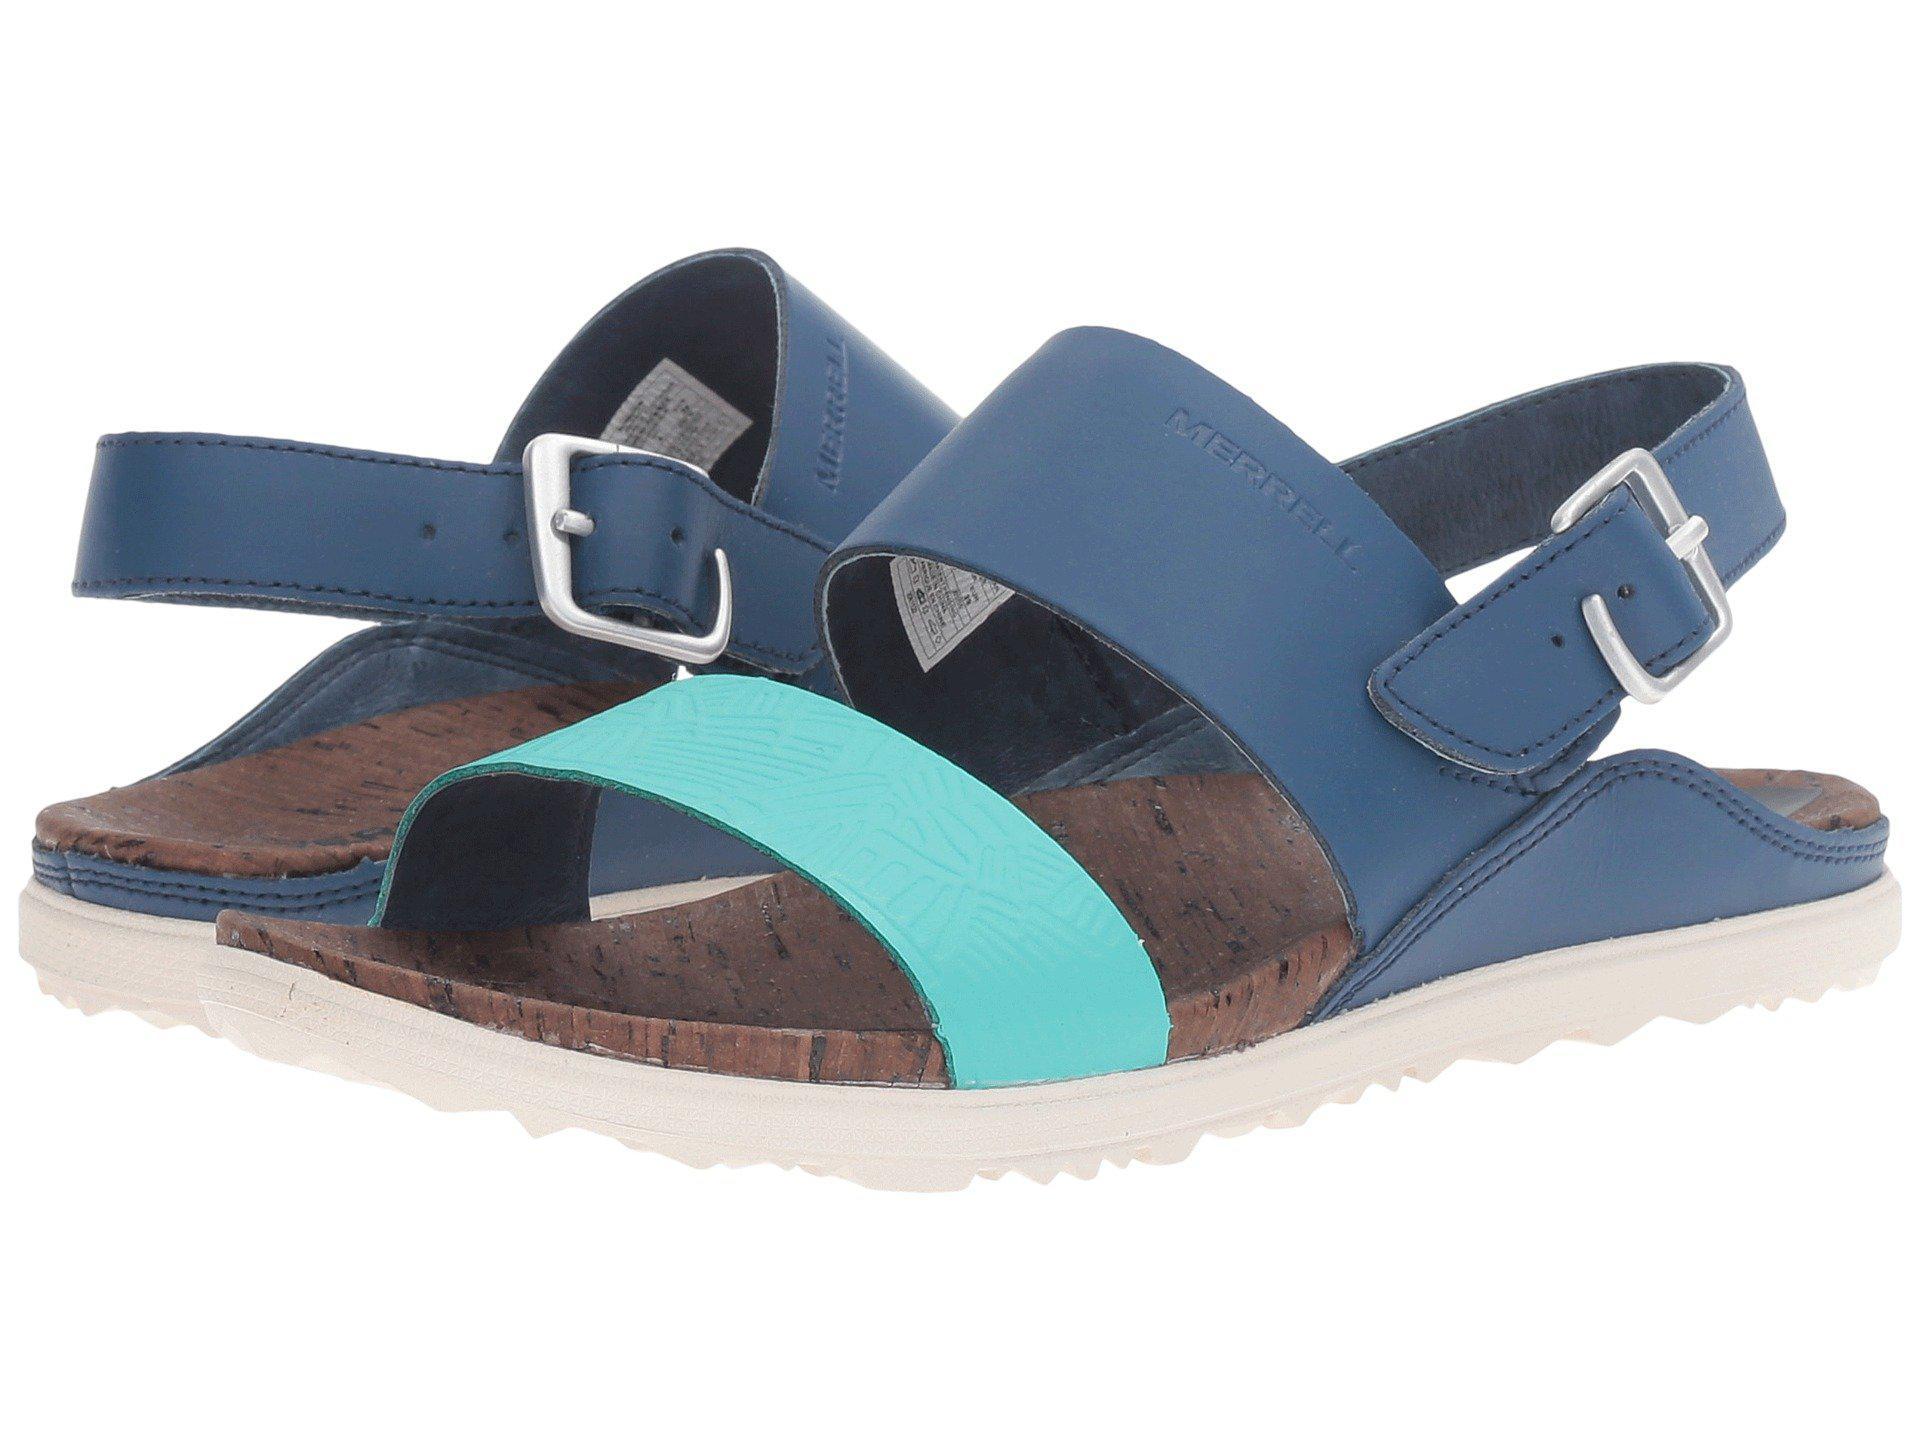 49c14039c0ba Merrell. Women s Blue Around Town Double Banded Color Block Backstrap Print  Sandals